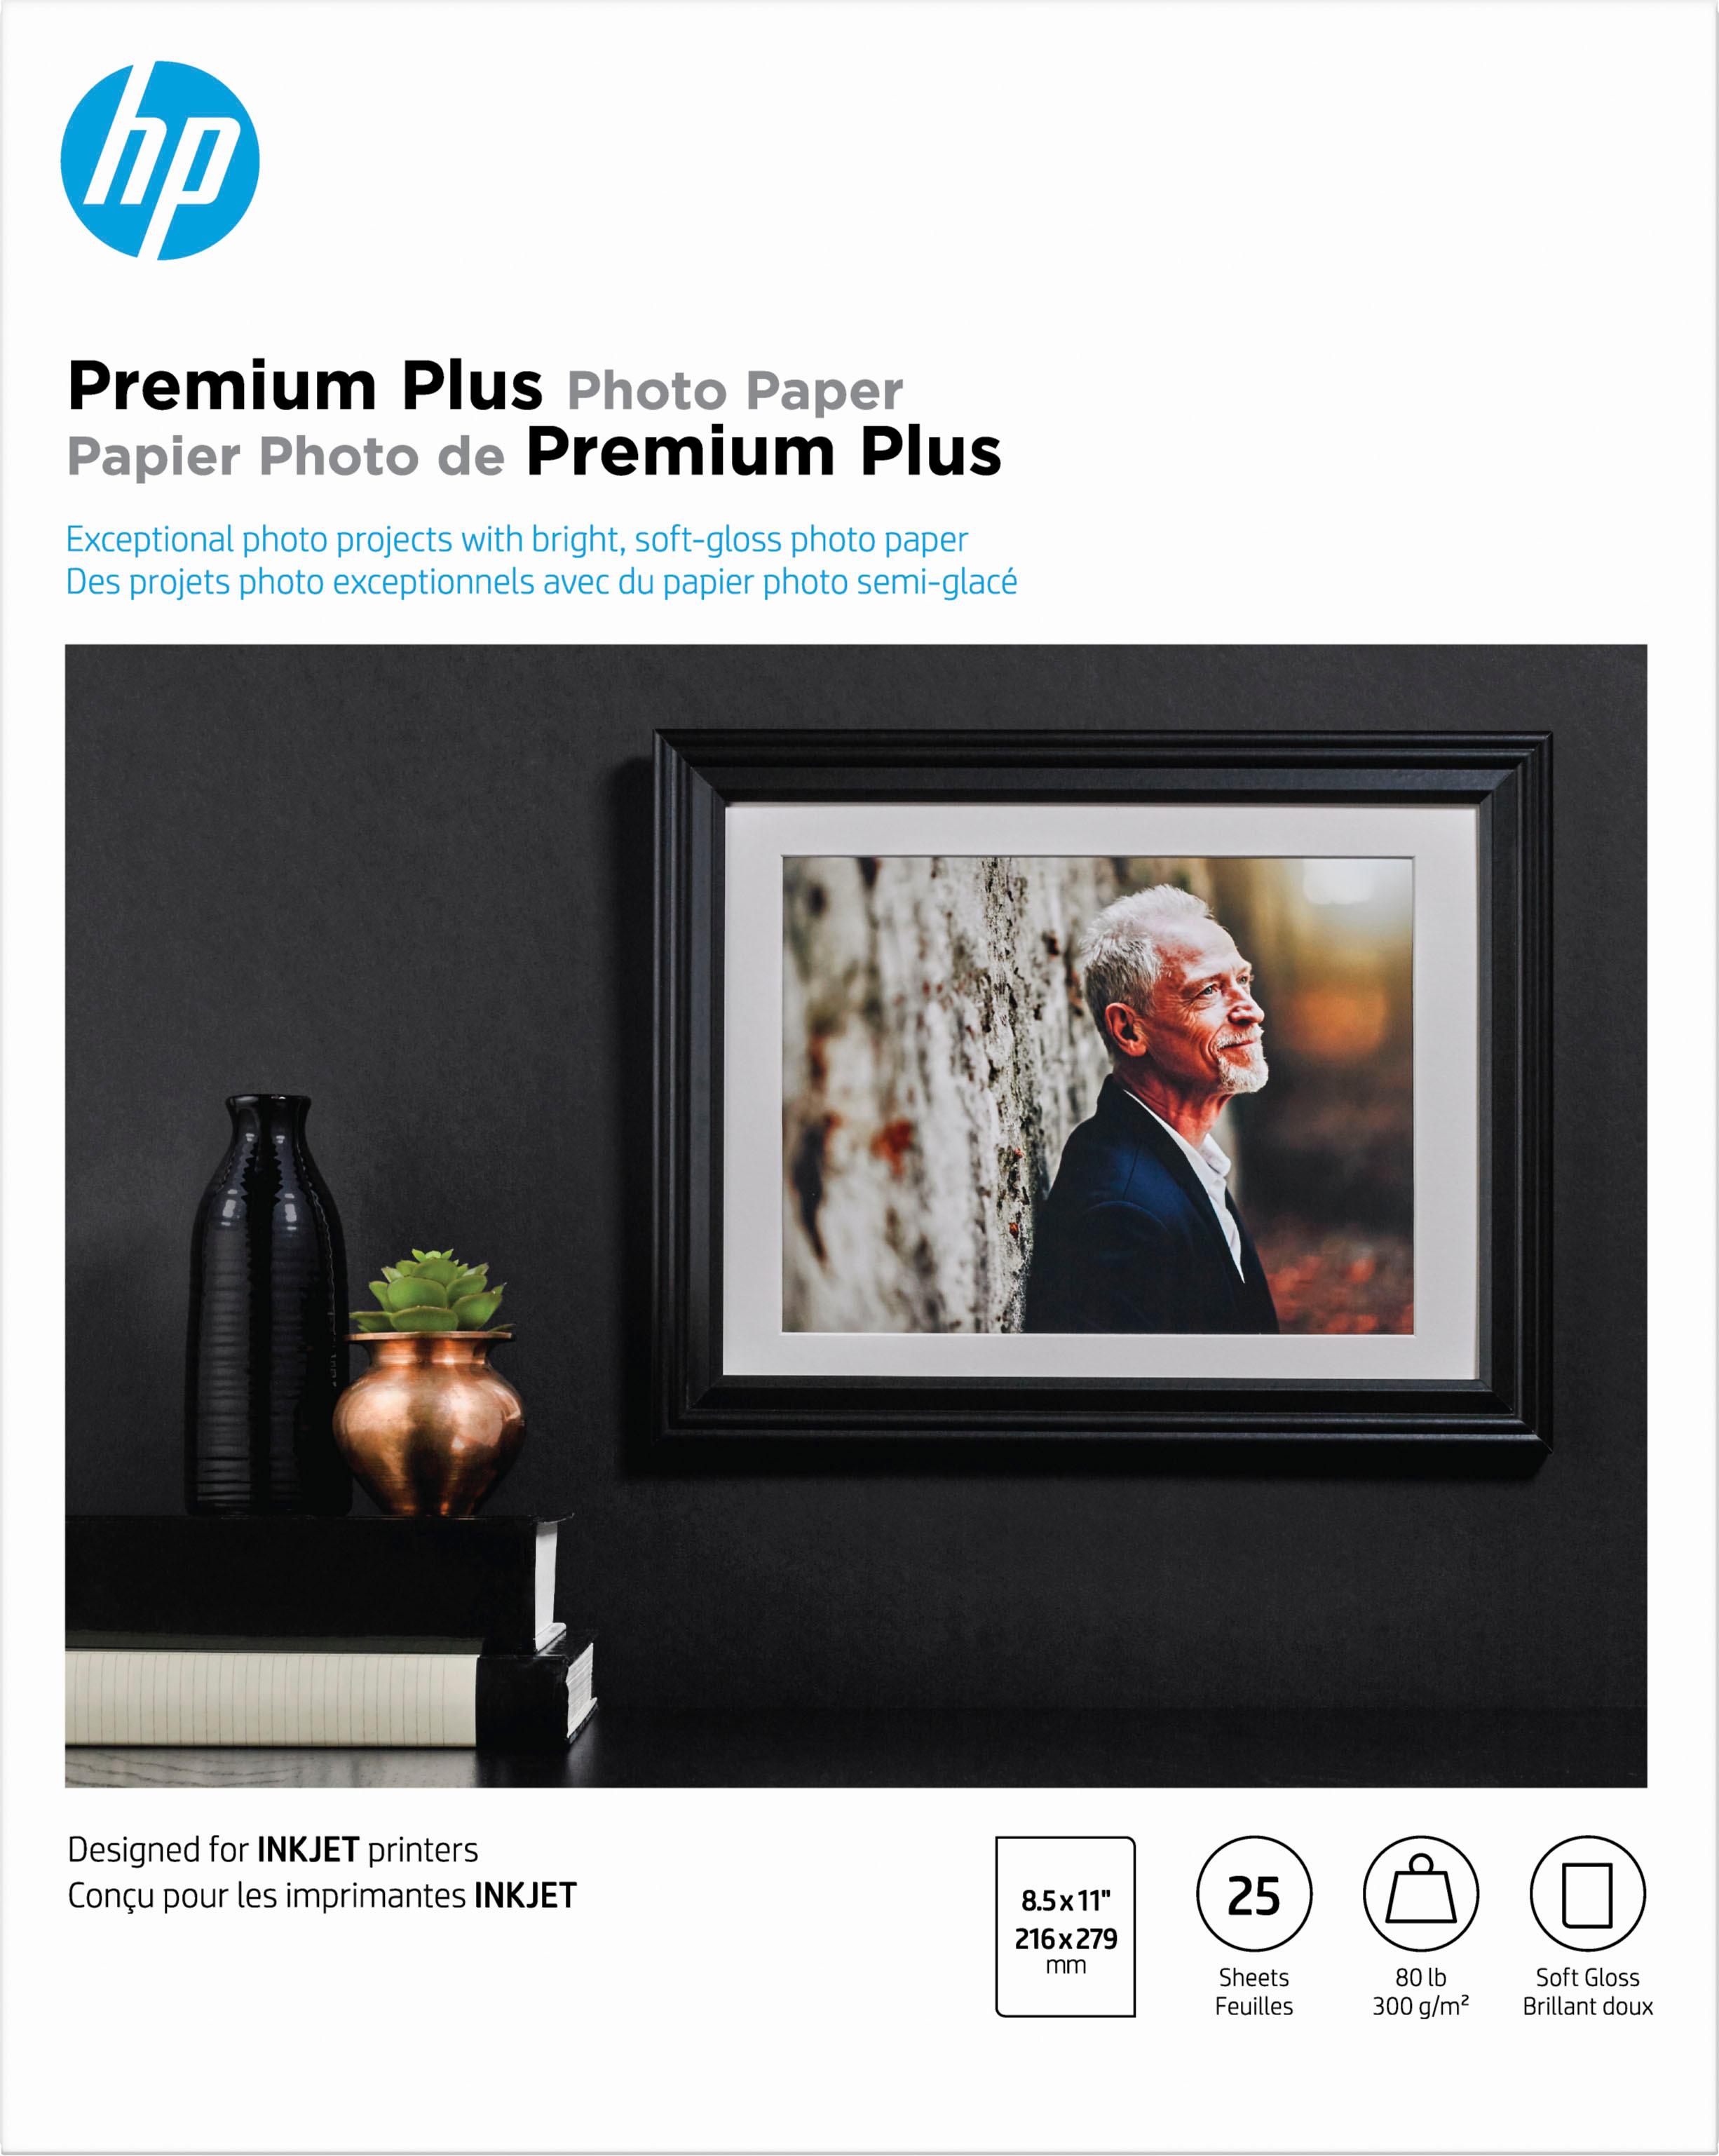 HP - Premium Plus Soft Glossy Inkjet Photo Paper - White